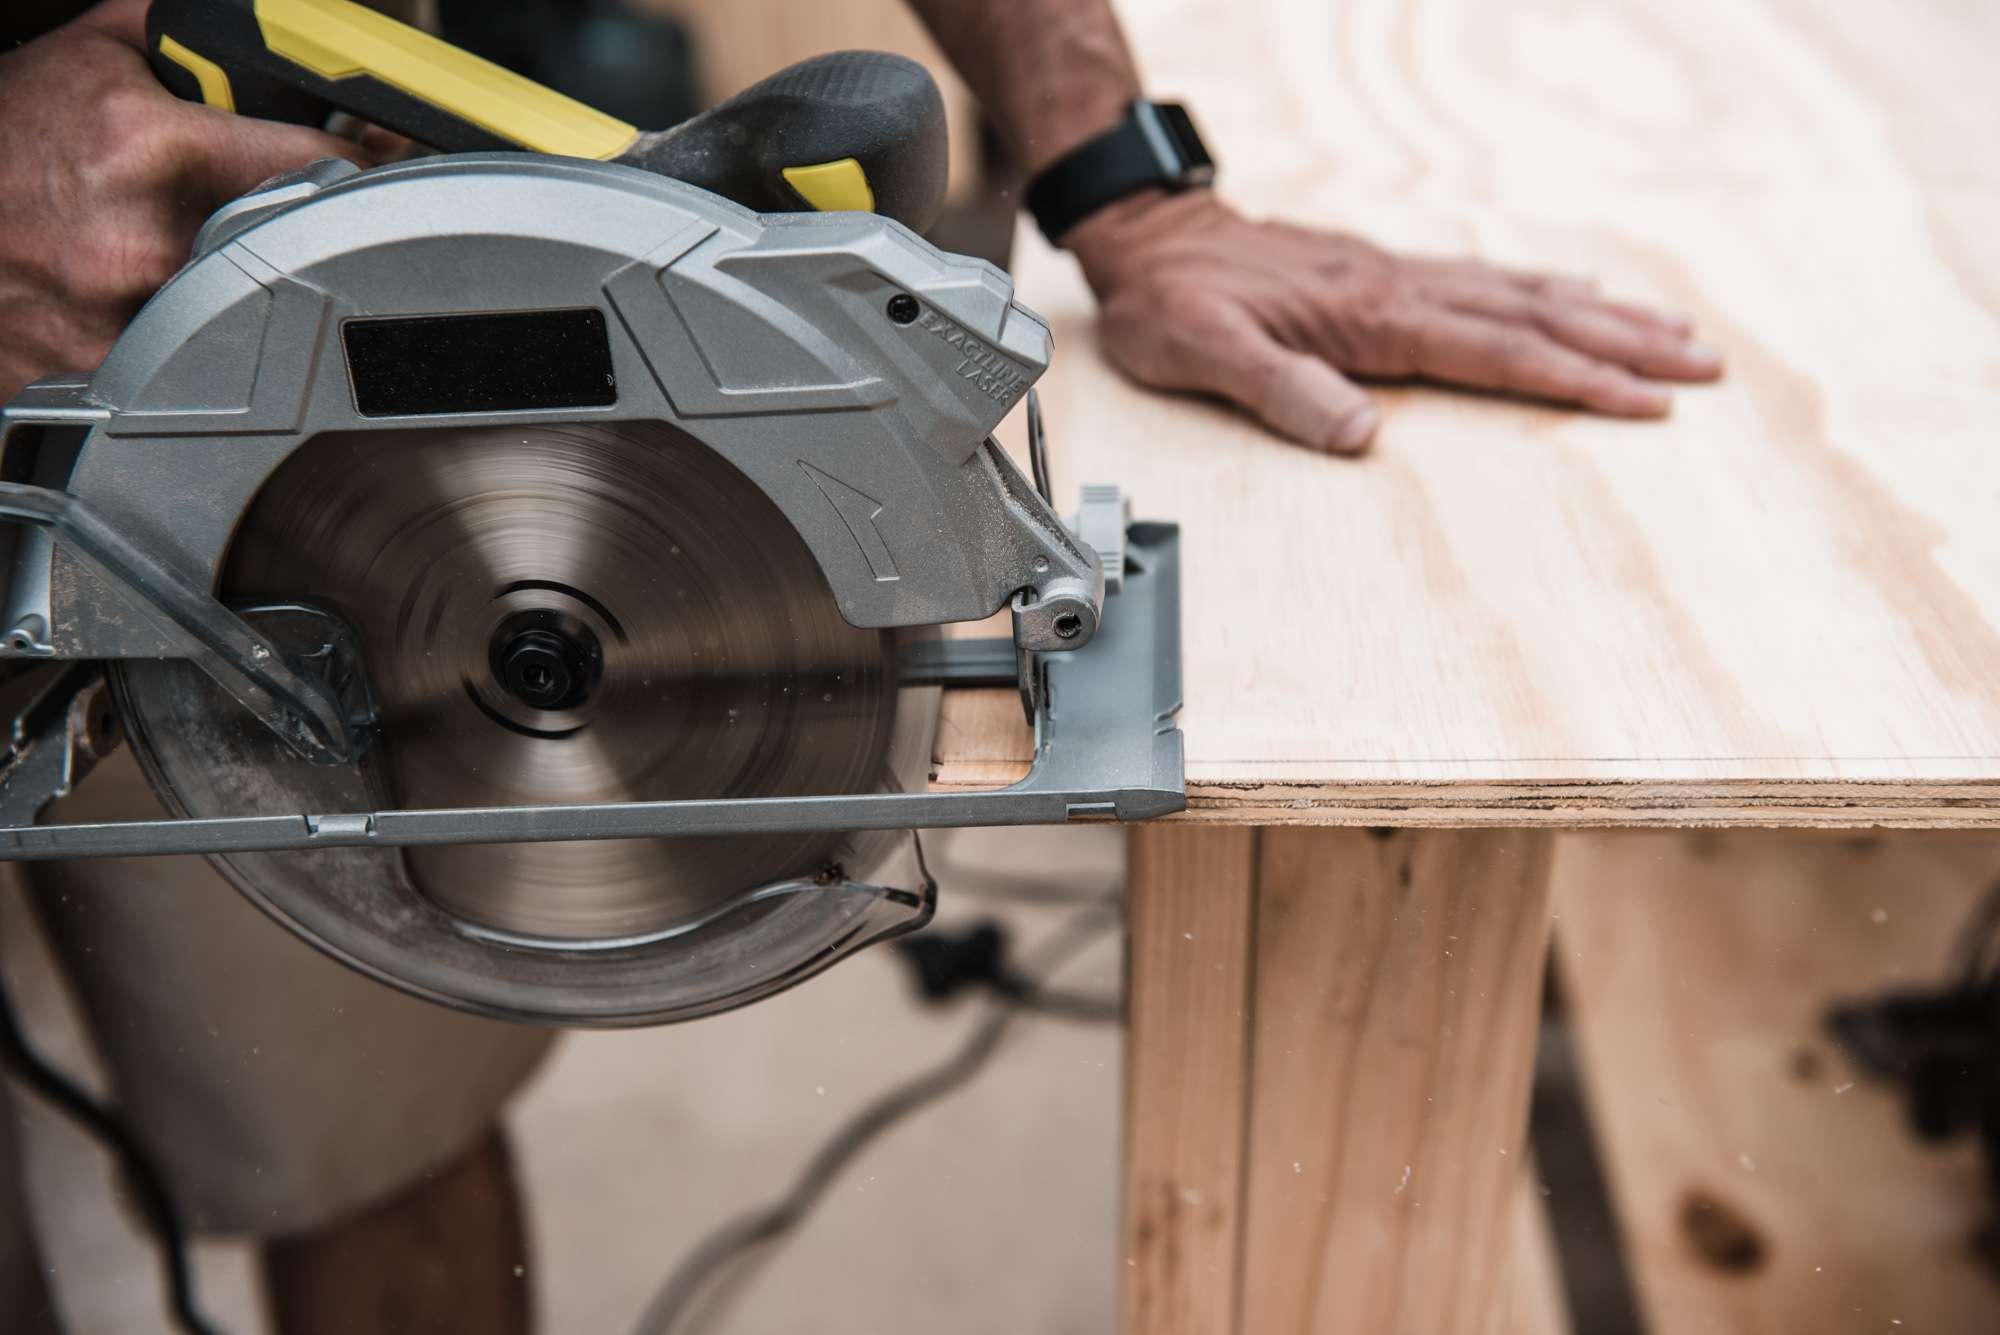 using a circular saw